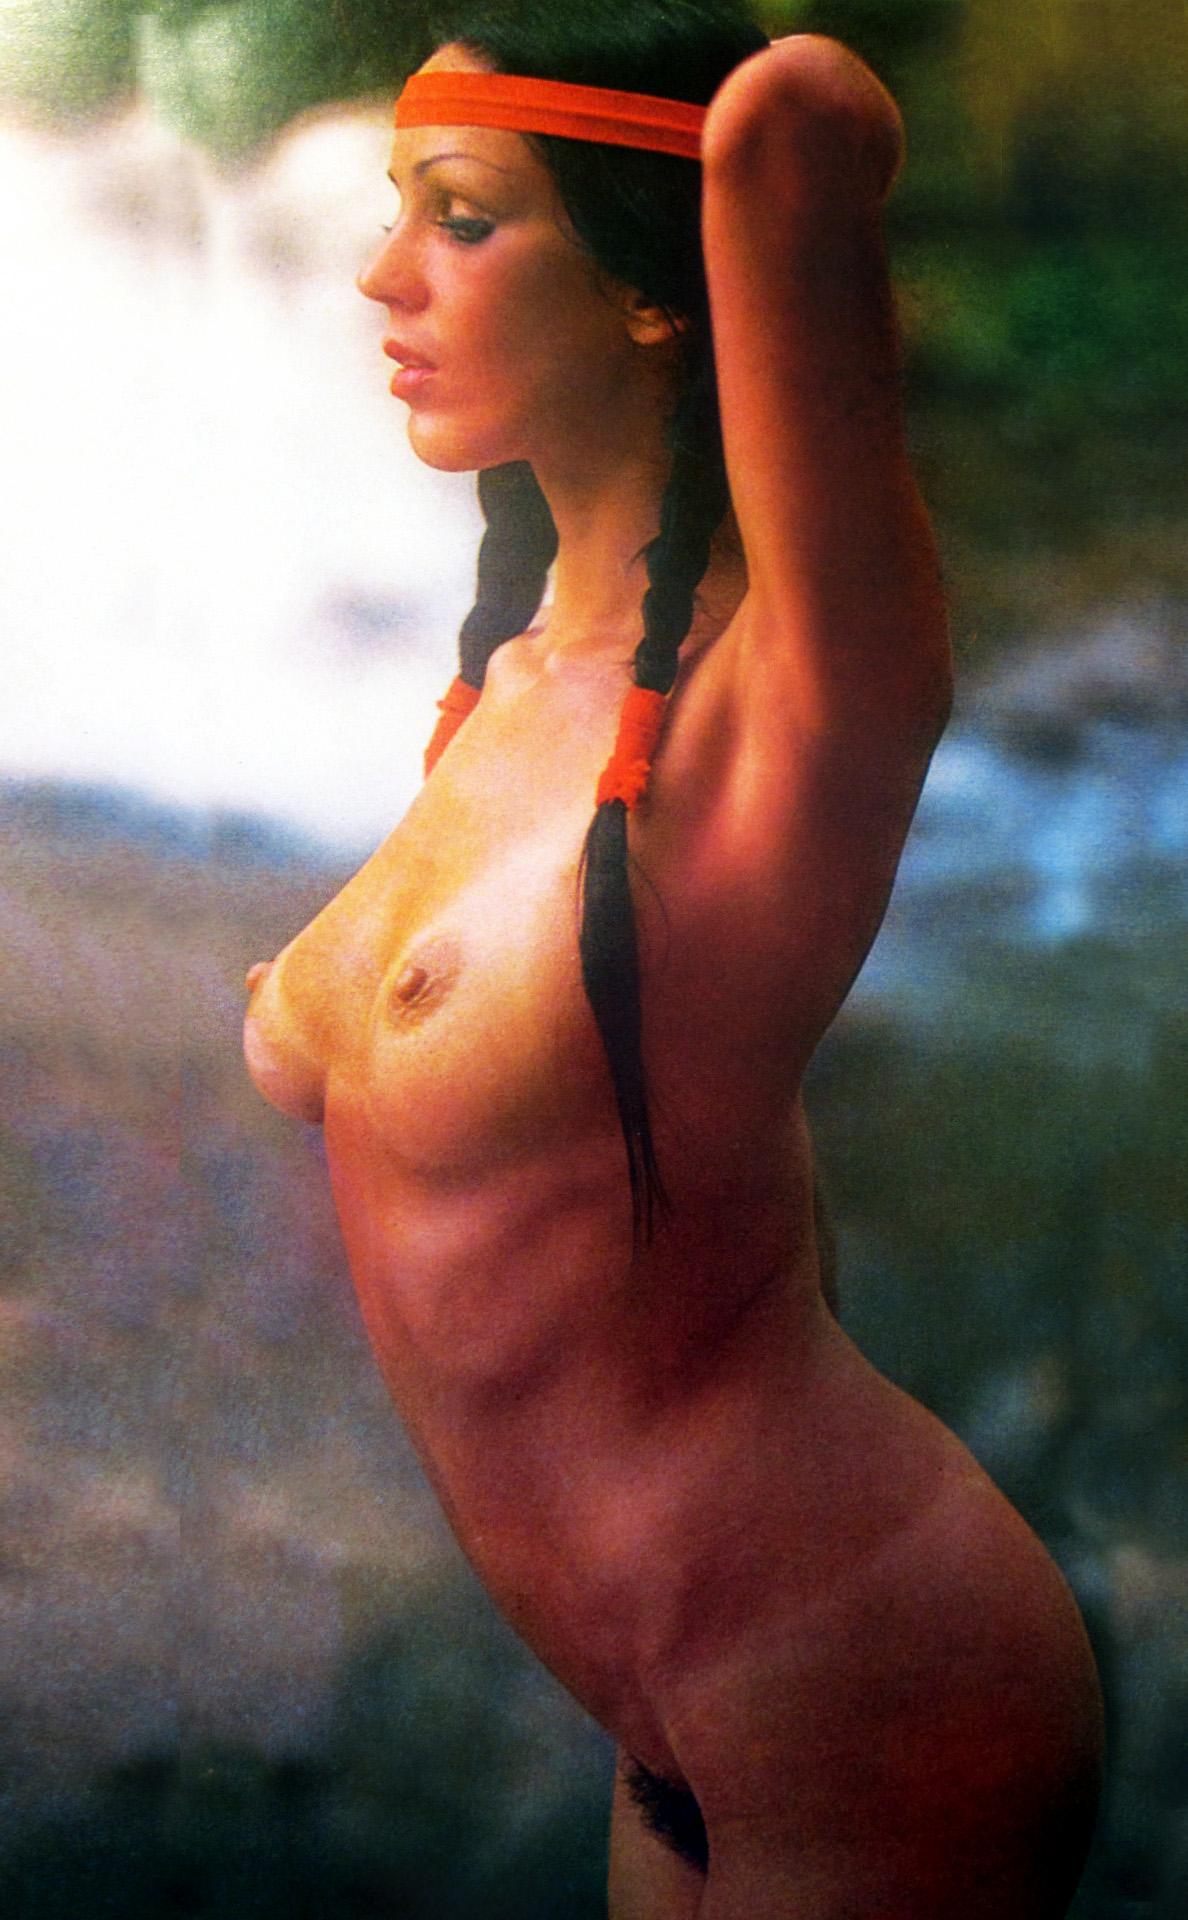 vintage-nude-photo-hippy-with-headband-braids